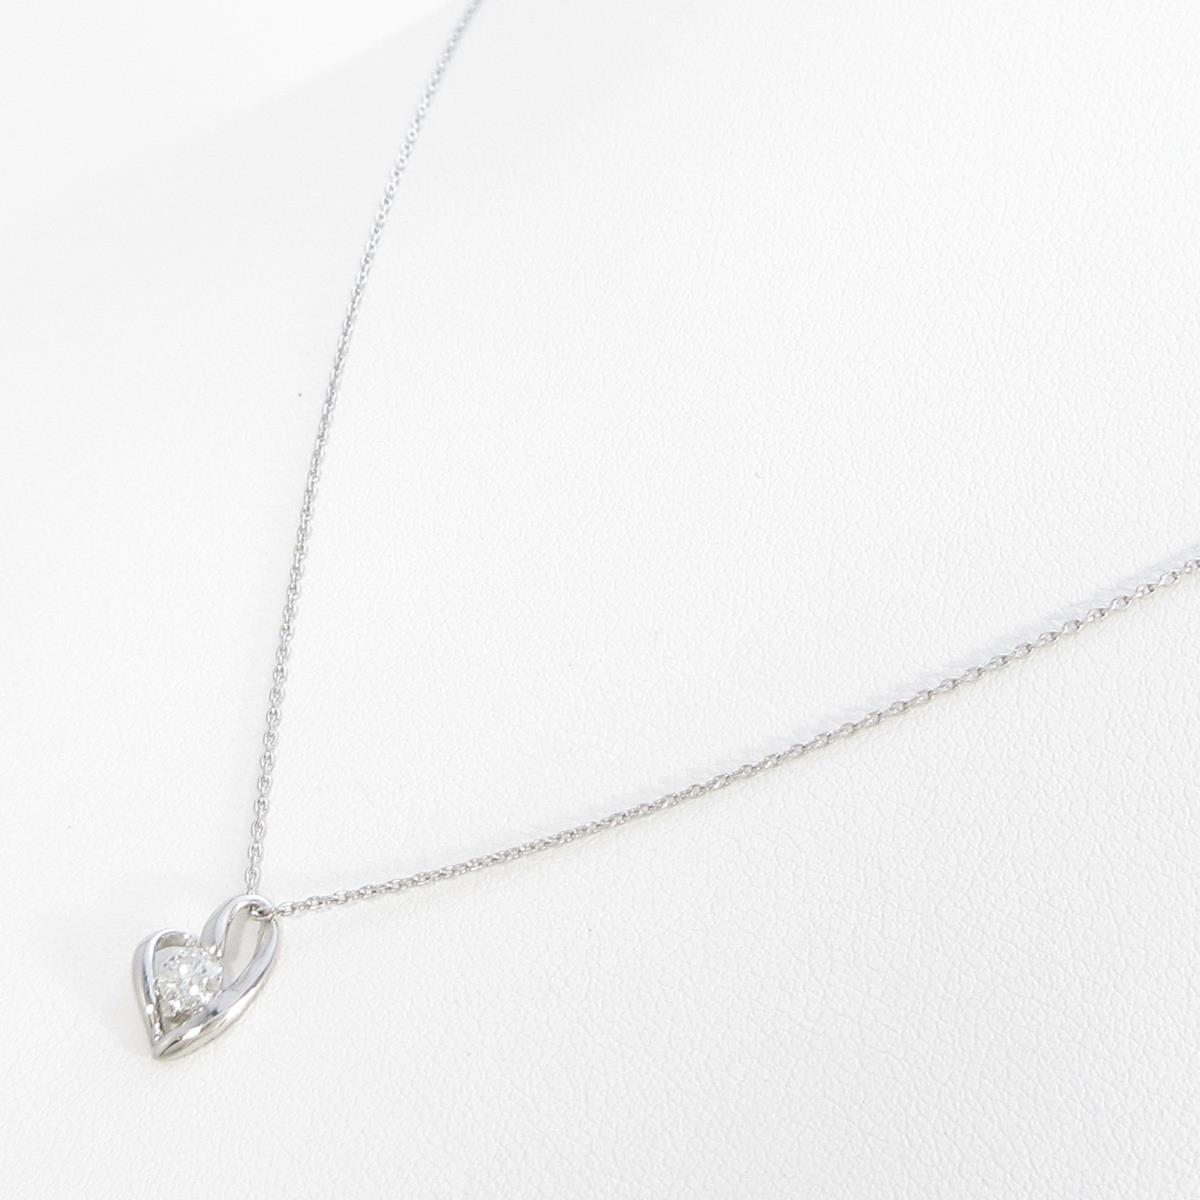 Collier Doré Multirang Bourgeon Perle Blanc 3 en 1 Fin Original  MYL2